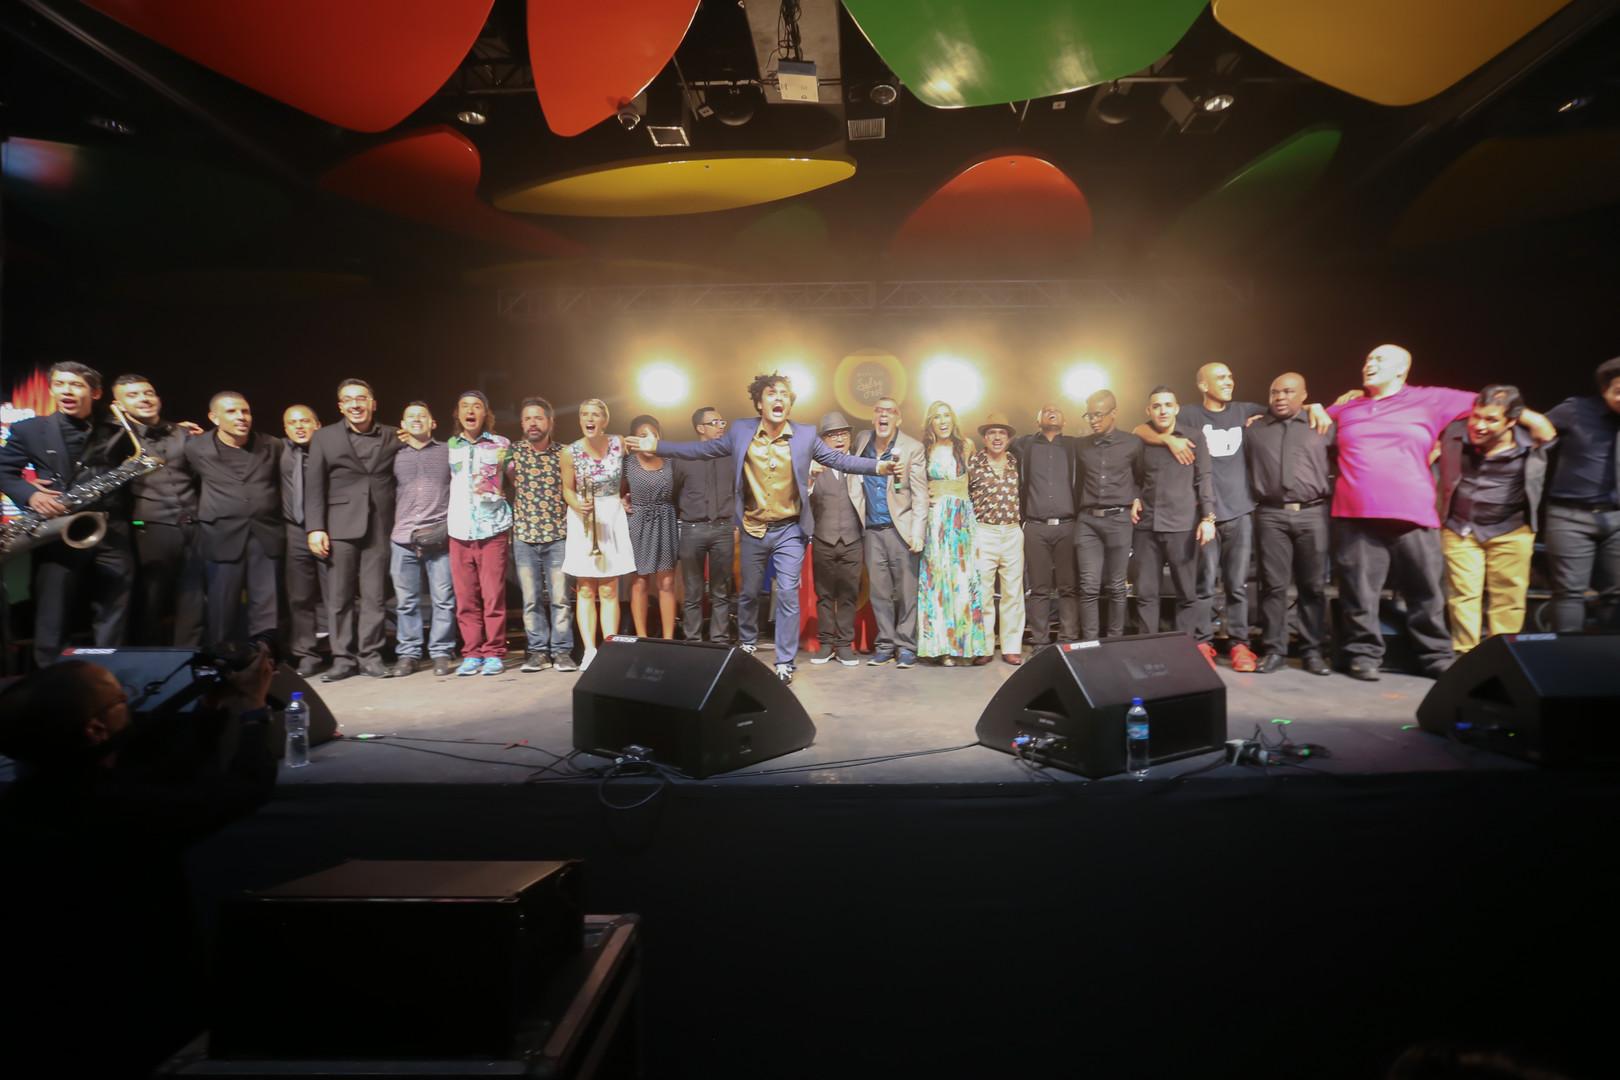 Medellín Salsa Fest